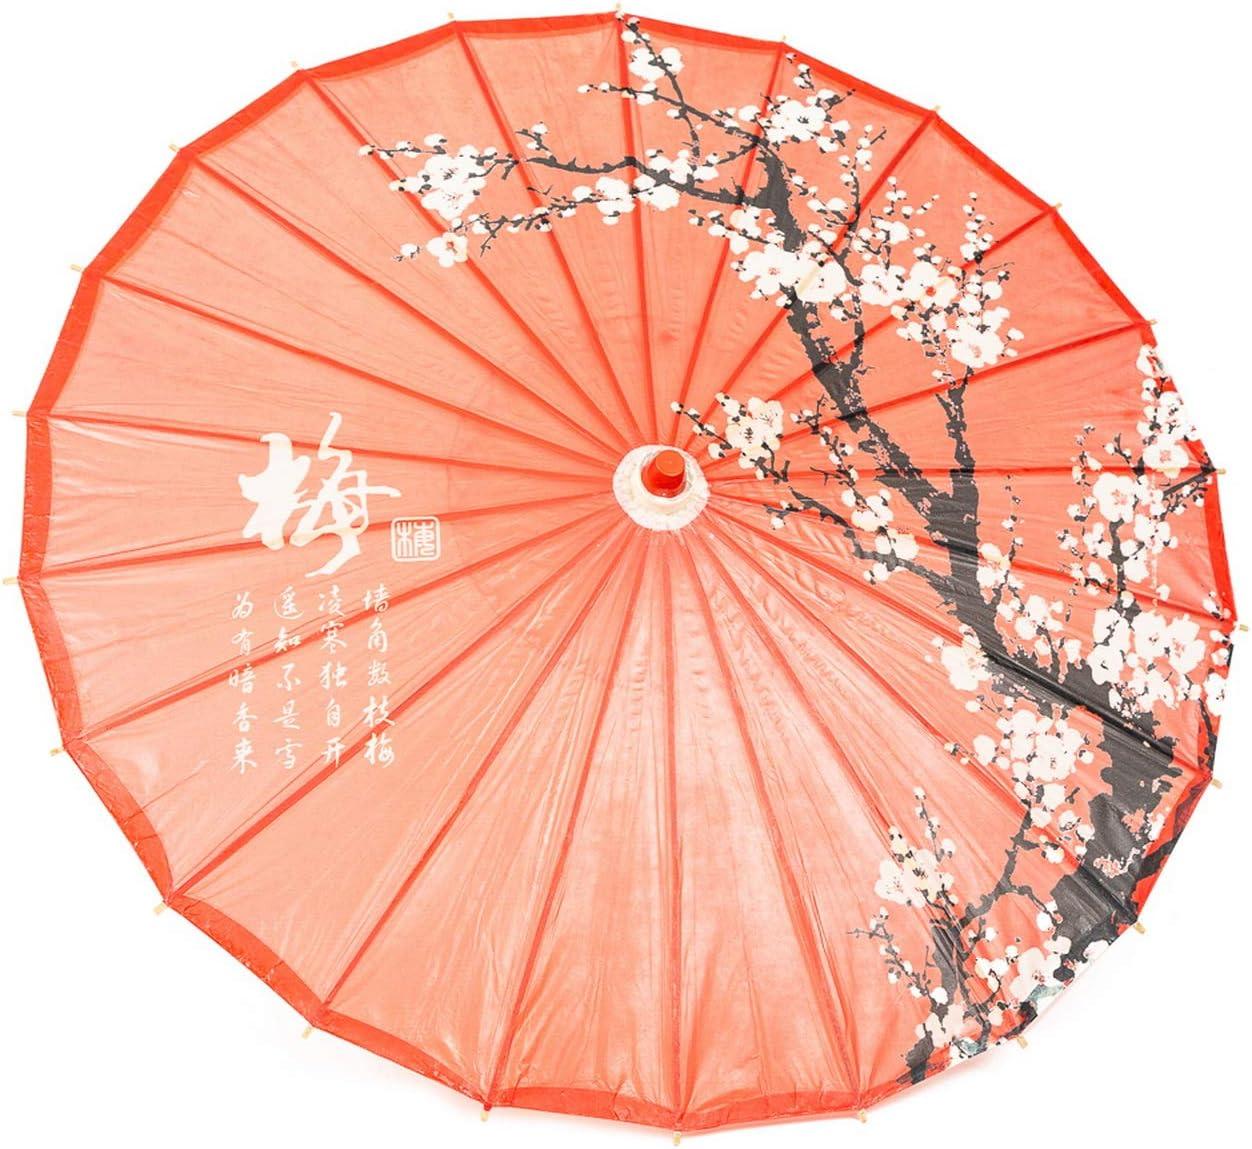 ASIAN HOME Rainproof Handmade Chinese Oiled Paper Umbrella Parasol 33